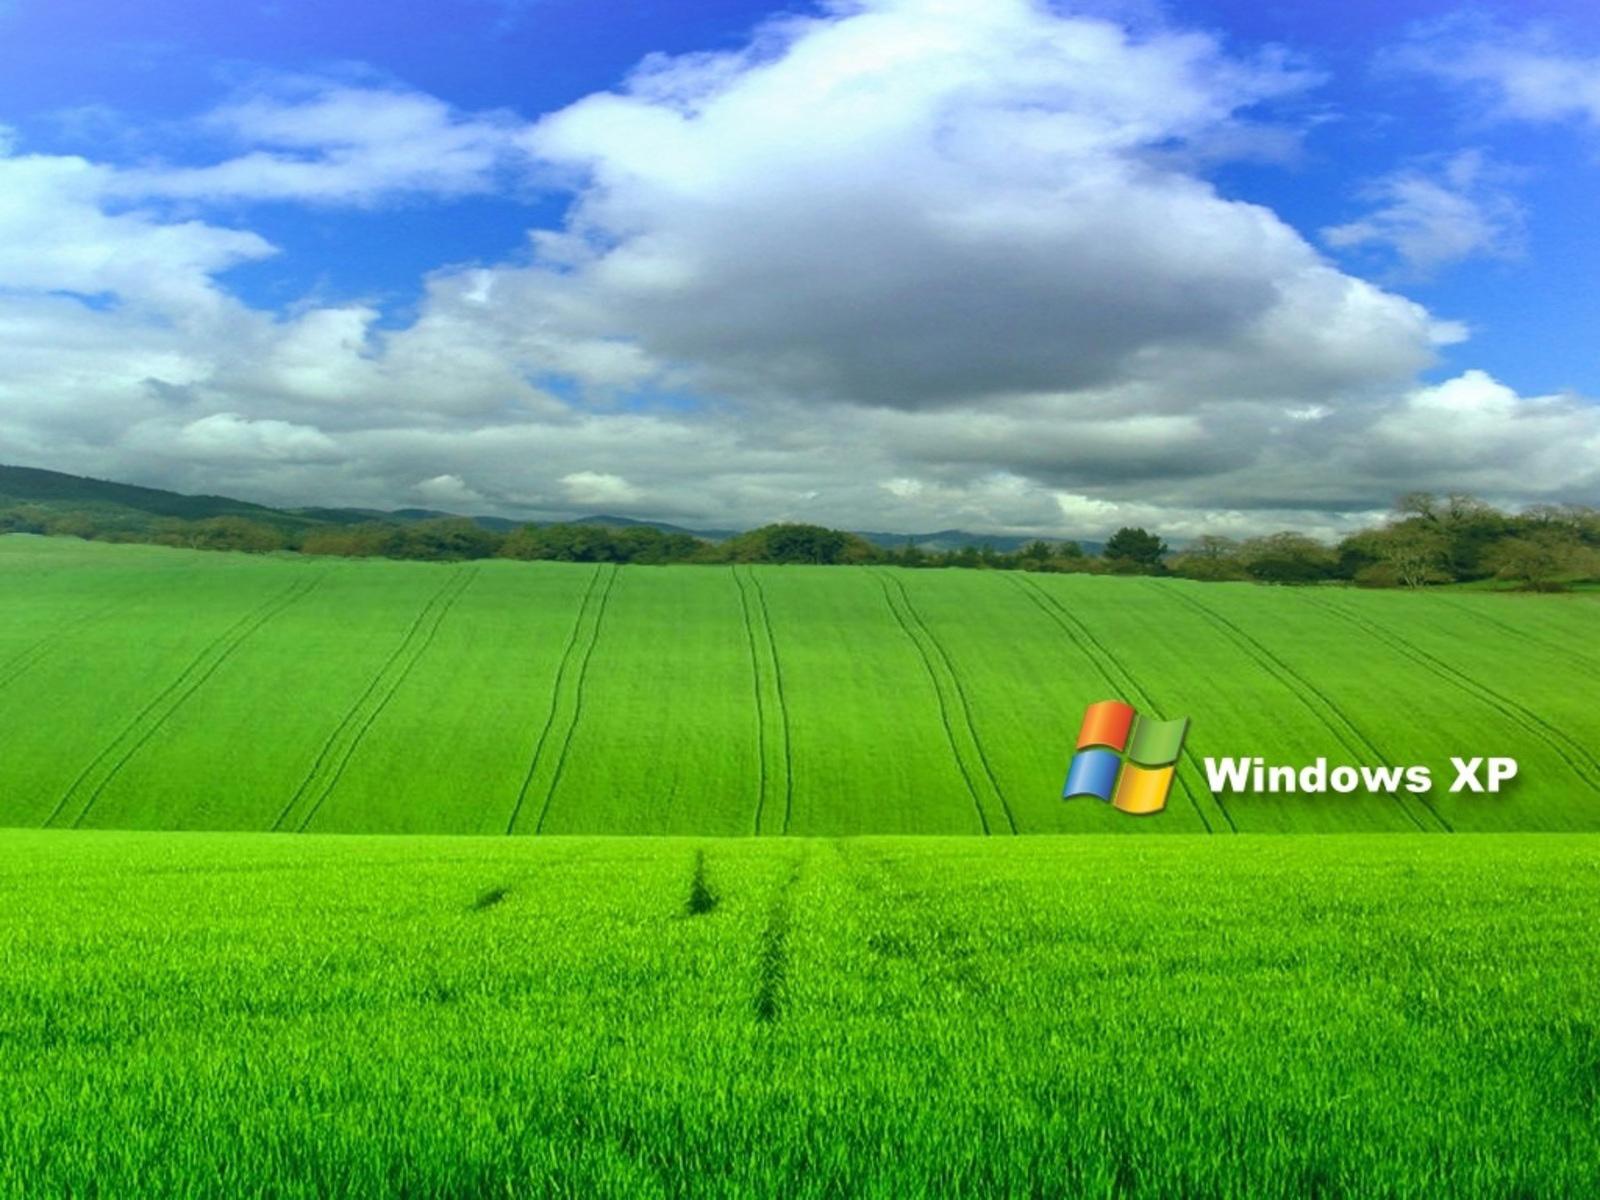 desktop backgrounds for windows xp desktop backgrounds for windows 1600x1200